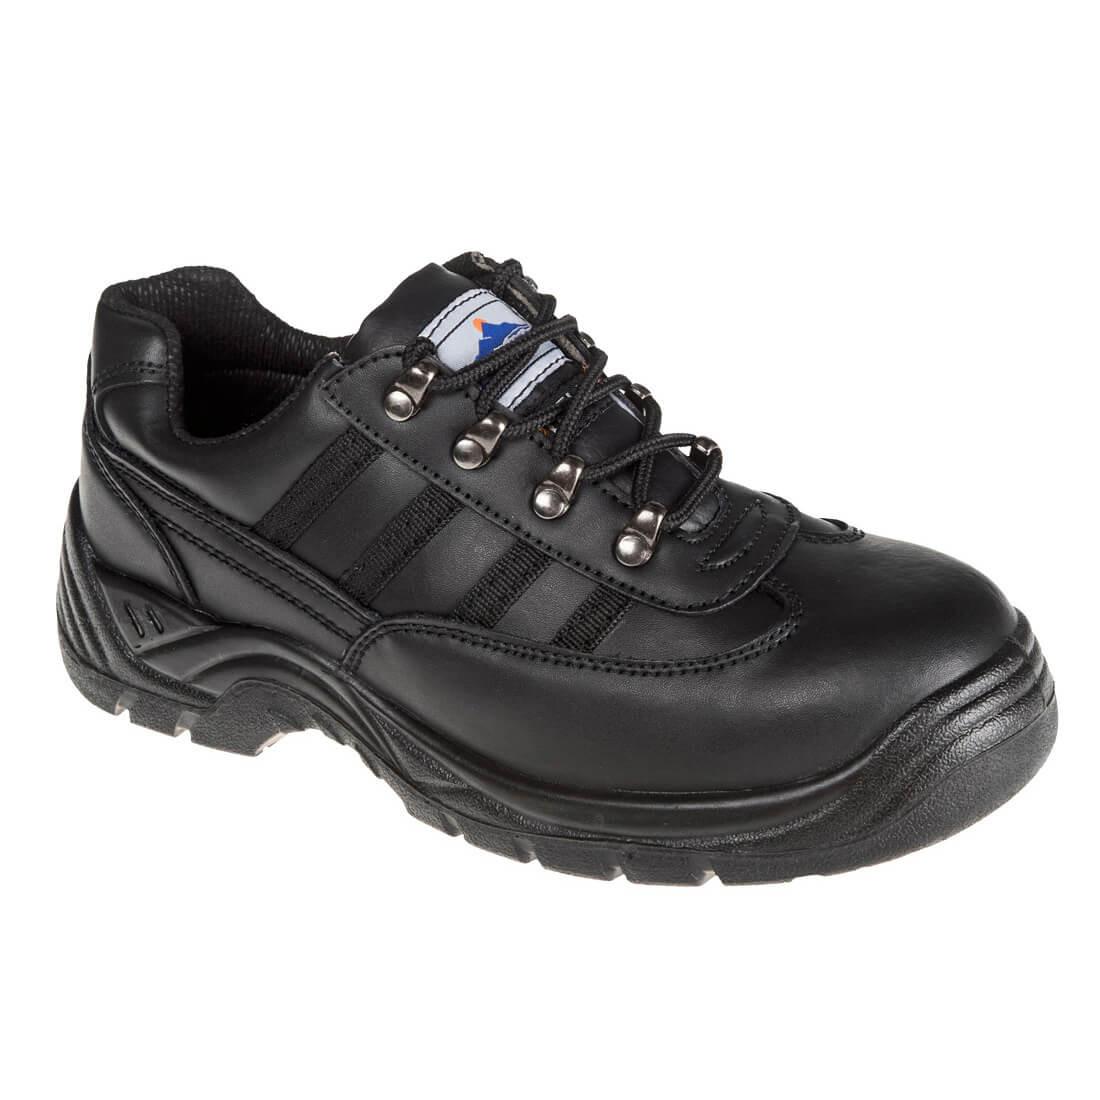 Bocanc Safety Trainer S1P Steelite™ - Incaltaminte de protectie